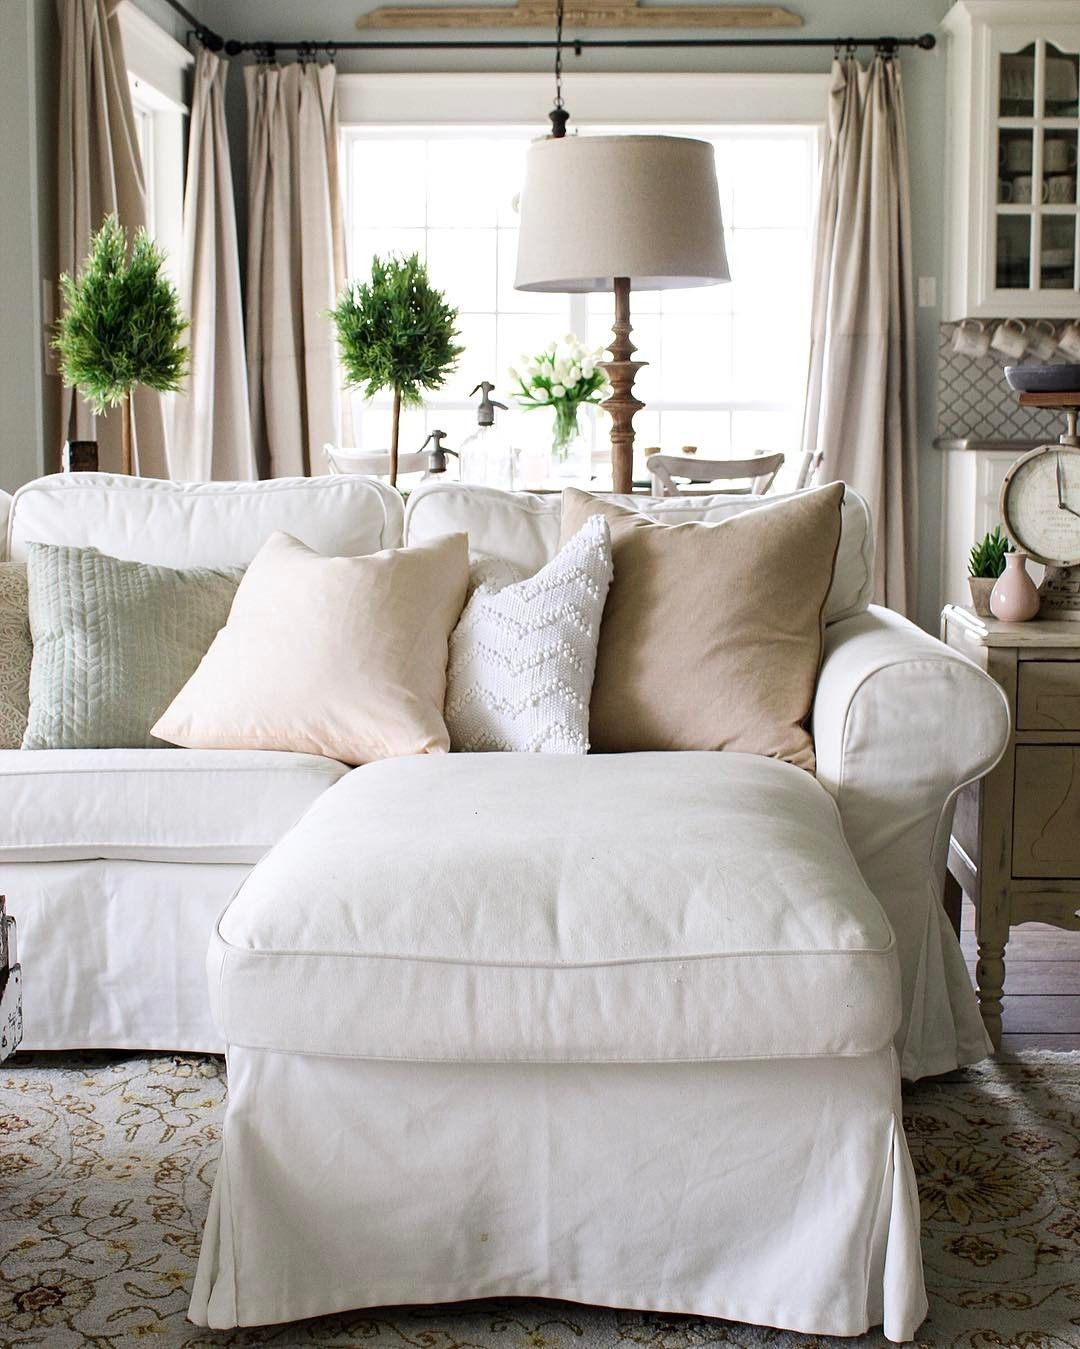 Wohnzimmer bauernhaus wohnzimmer bauernhaus chic wohnräume schonbezüge innere haus cottage living beautiful living rooms